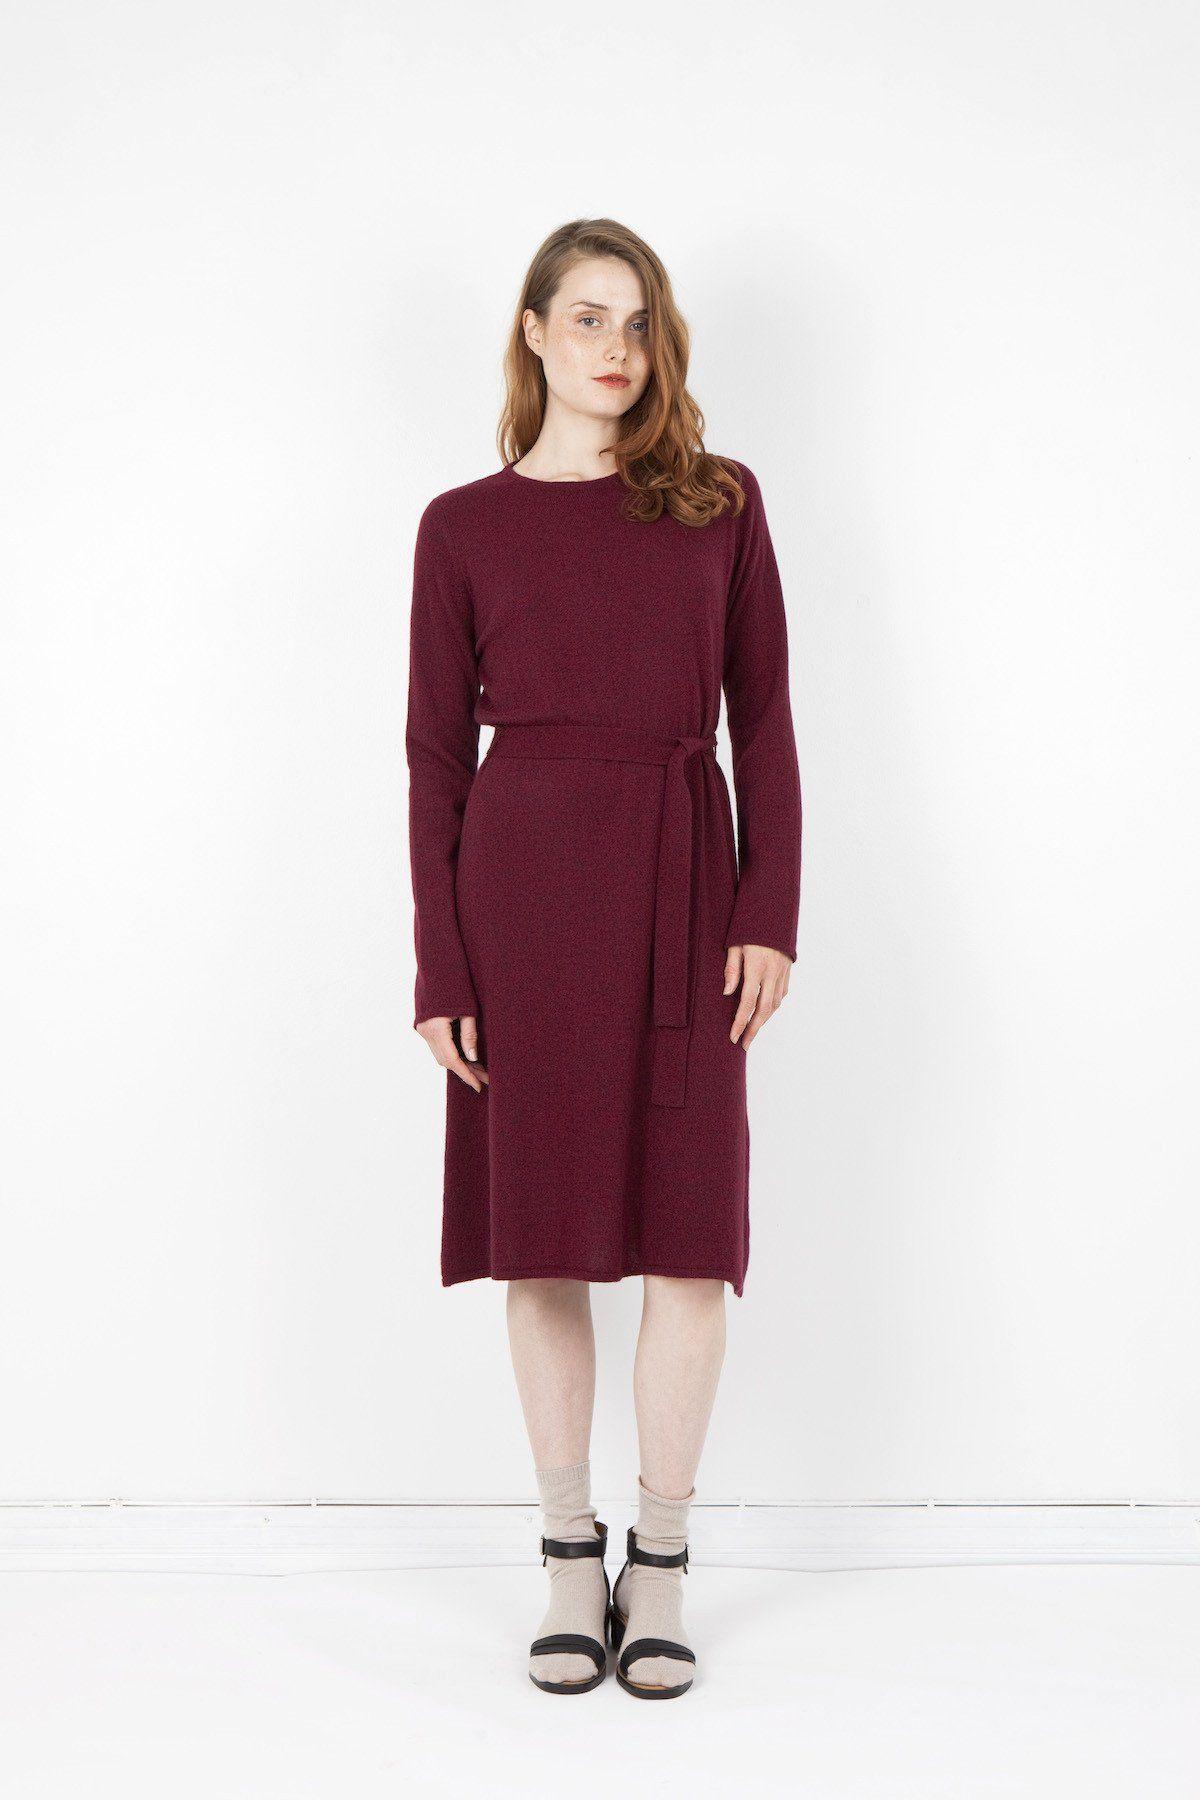 Tovia dress in dark red womenus ethical fashion clothing